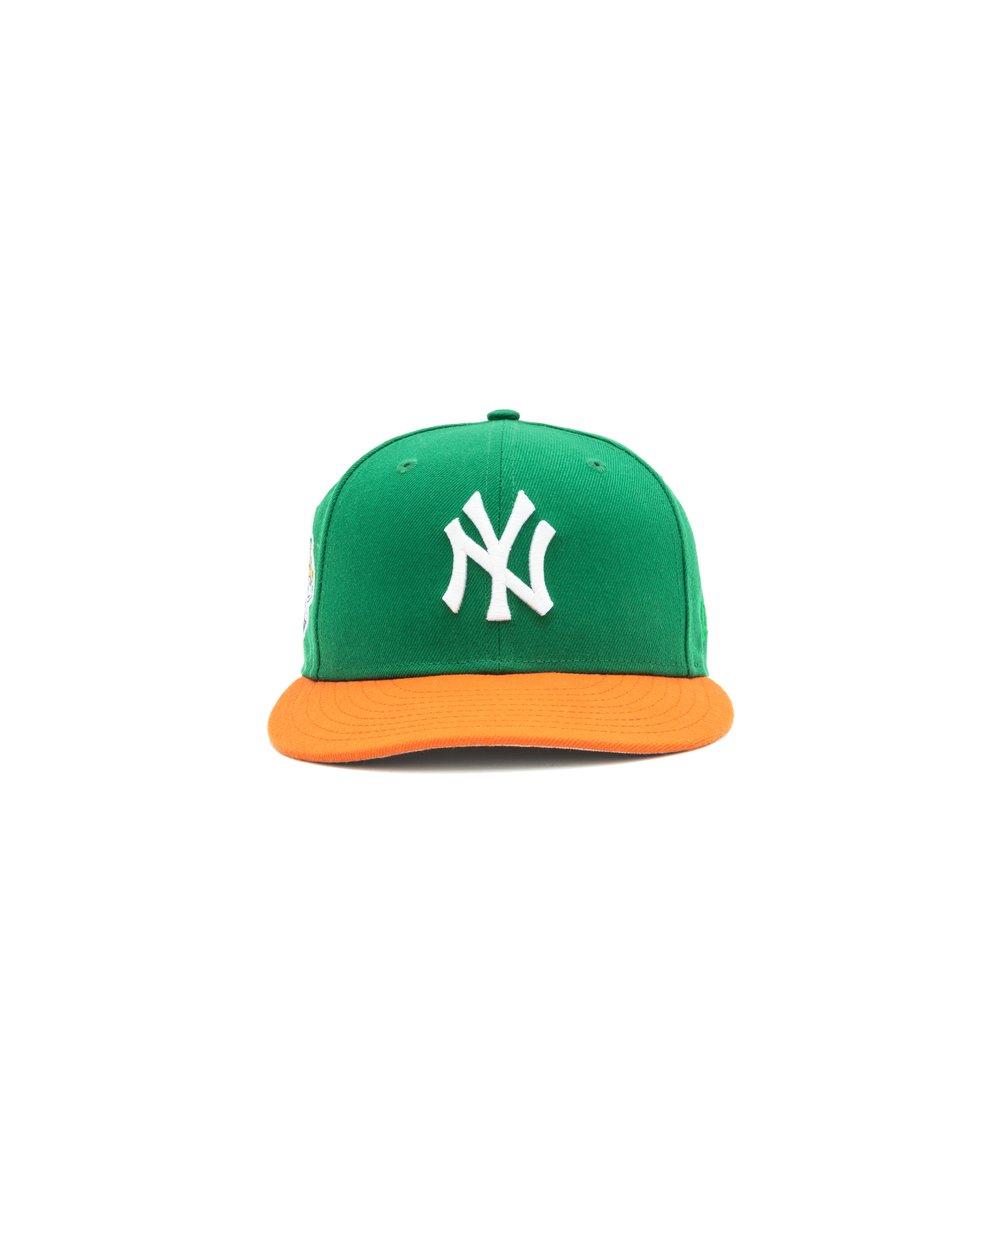 Image of Hat Club x JaeTips- Yankee Green/Orange